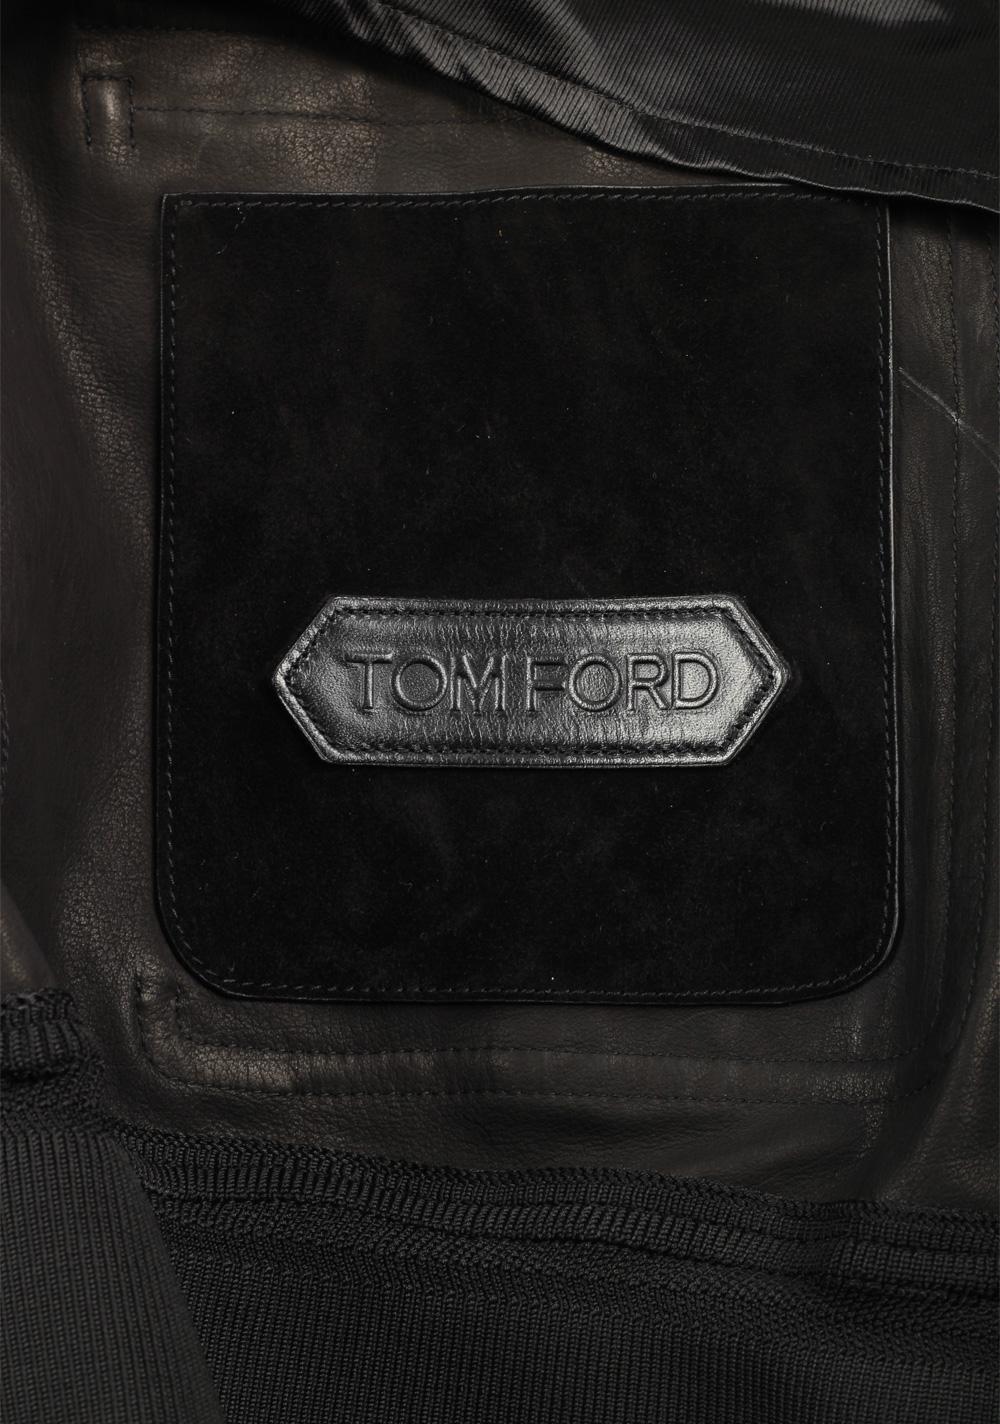 TOM FORD Black Cashmere Suede Bomber Jacket Coat Size 48 / 38R U.S. Outerwear   Costume Limité